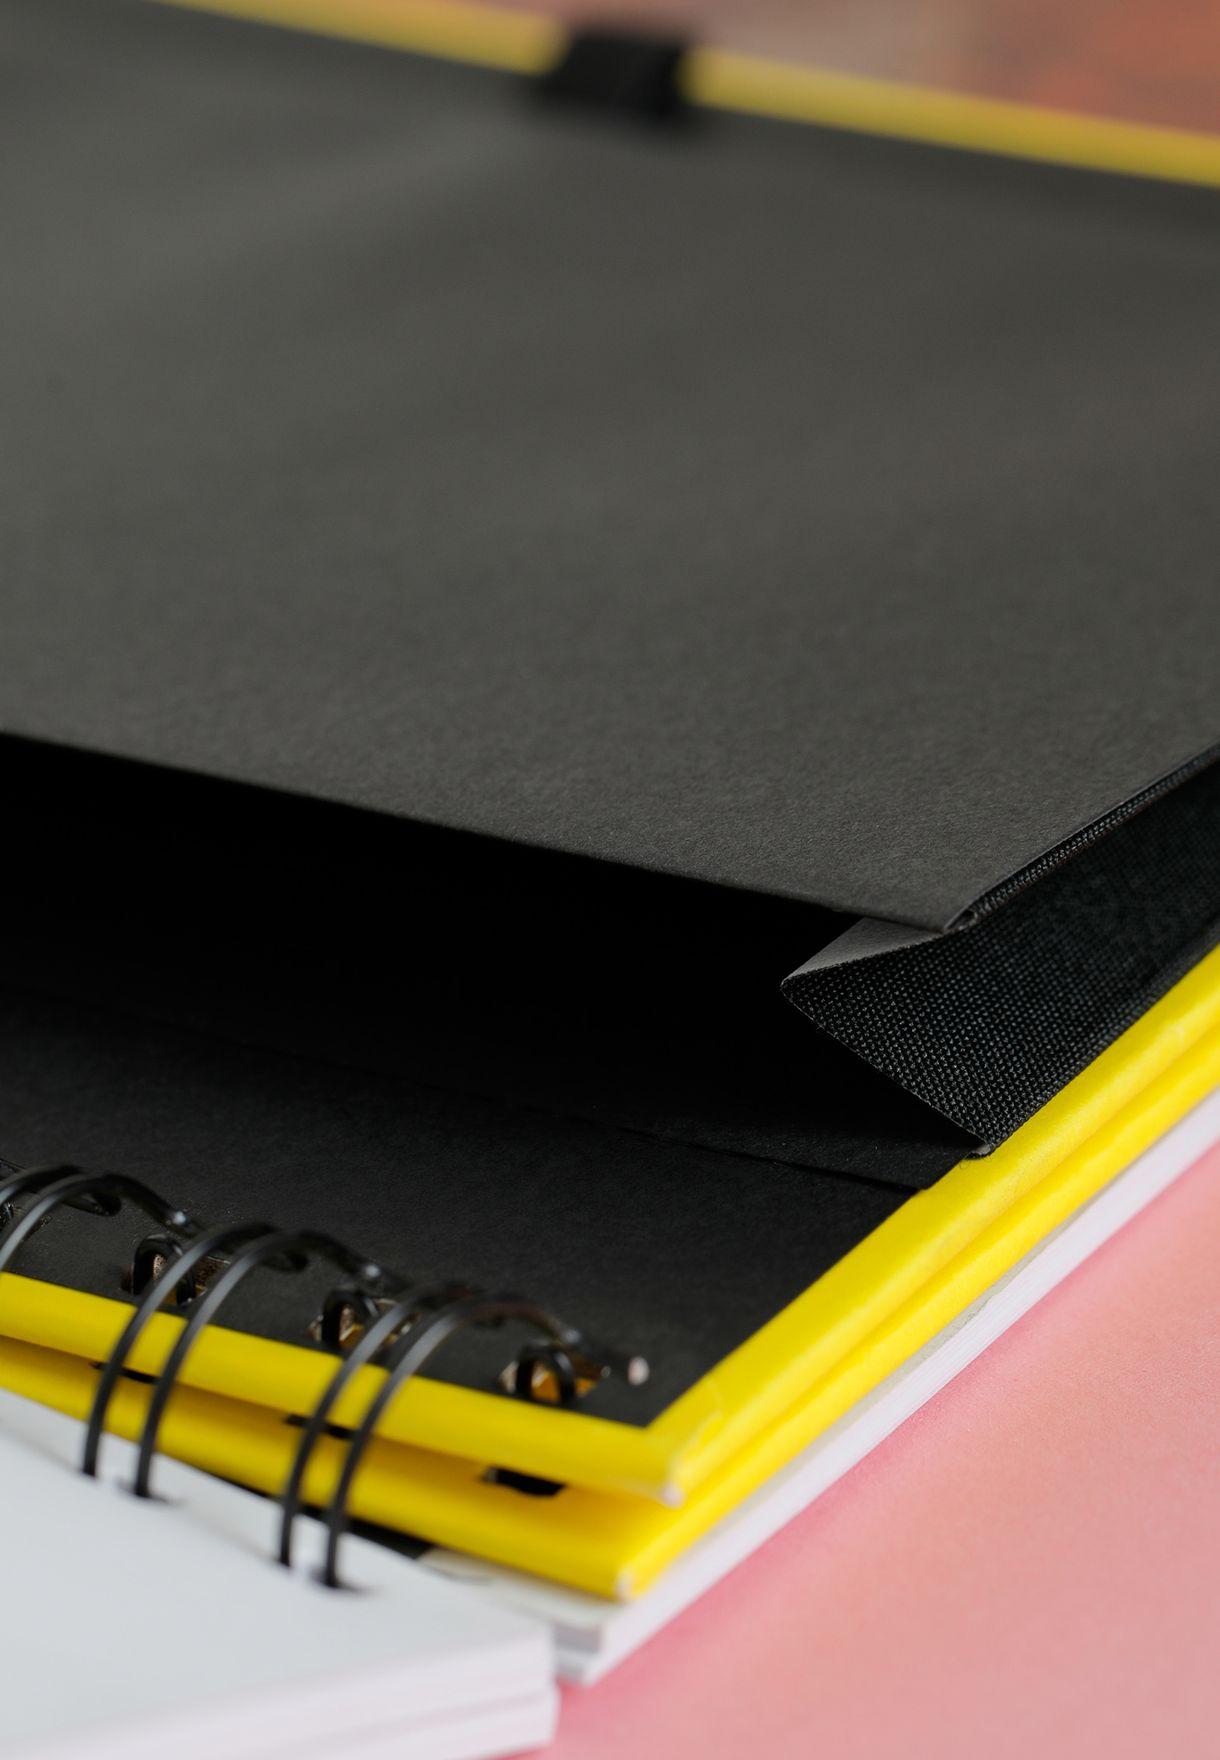 دفتر تخطيط 2021/22 للطلاب